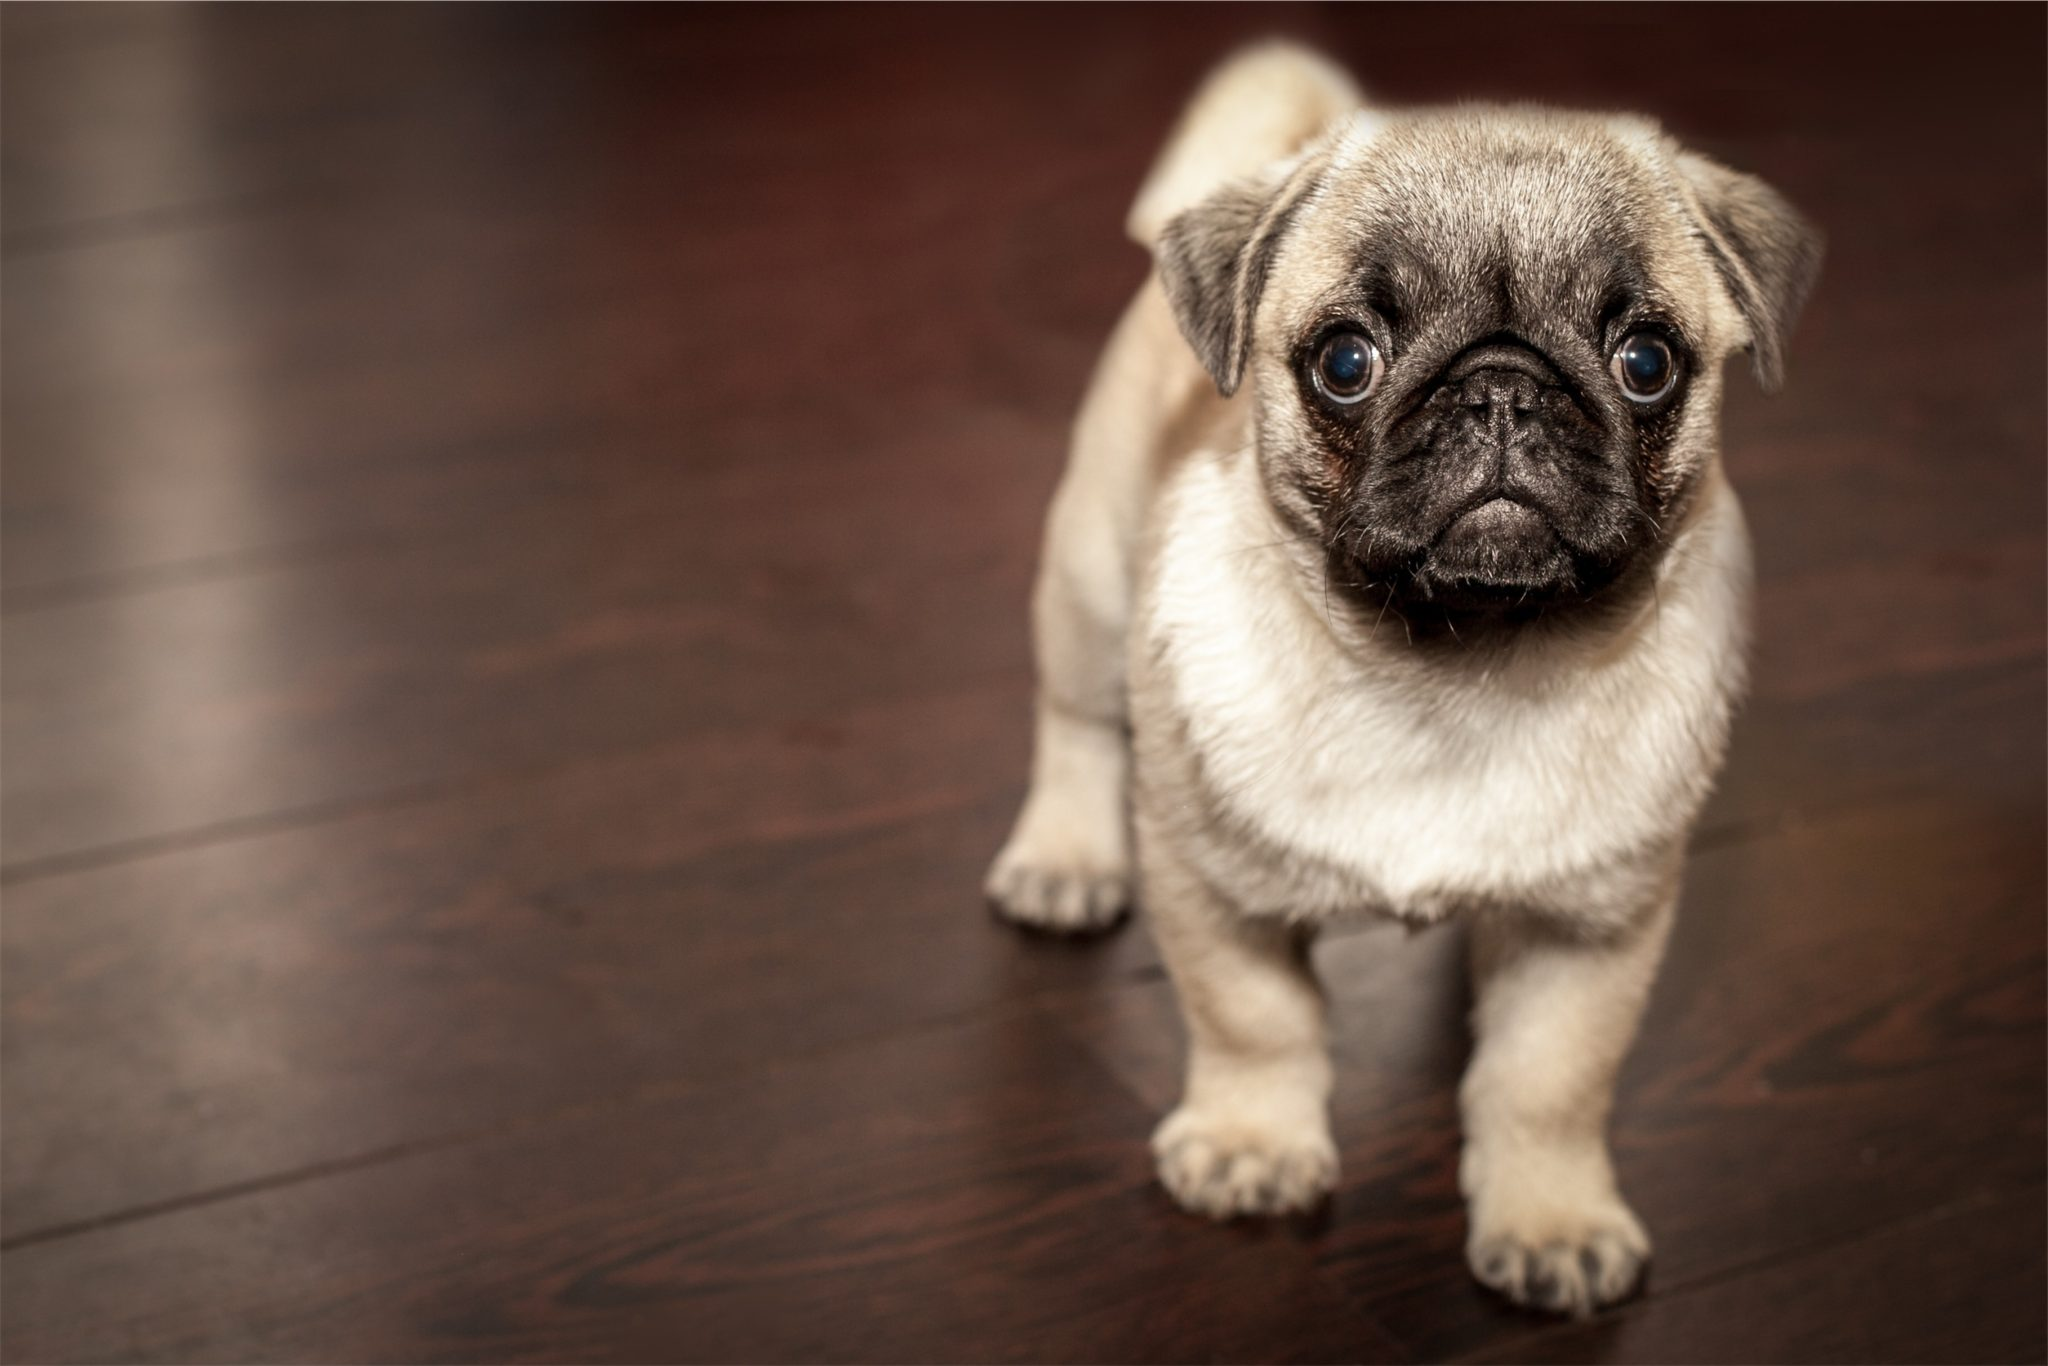 Standing pug dog by Matthew Szwedowski from stocksnap.io